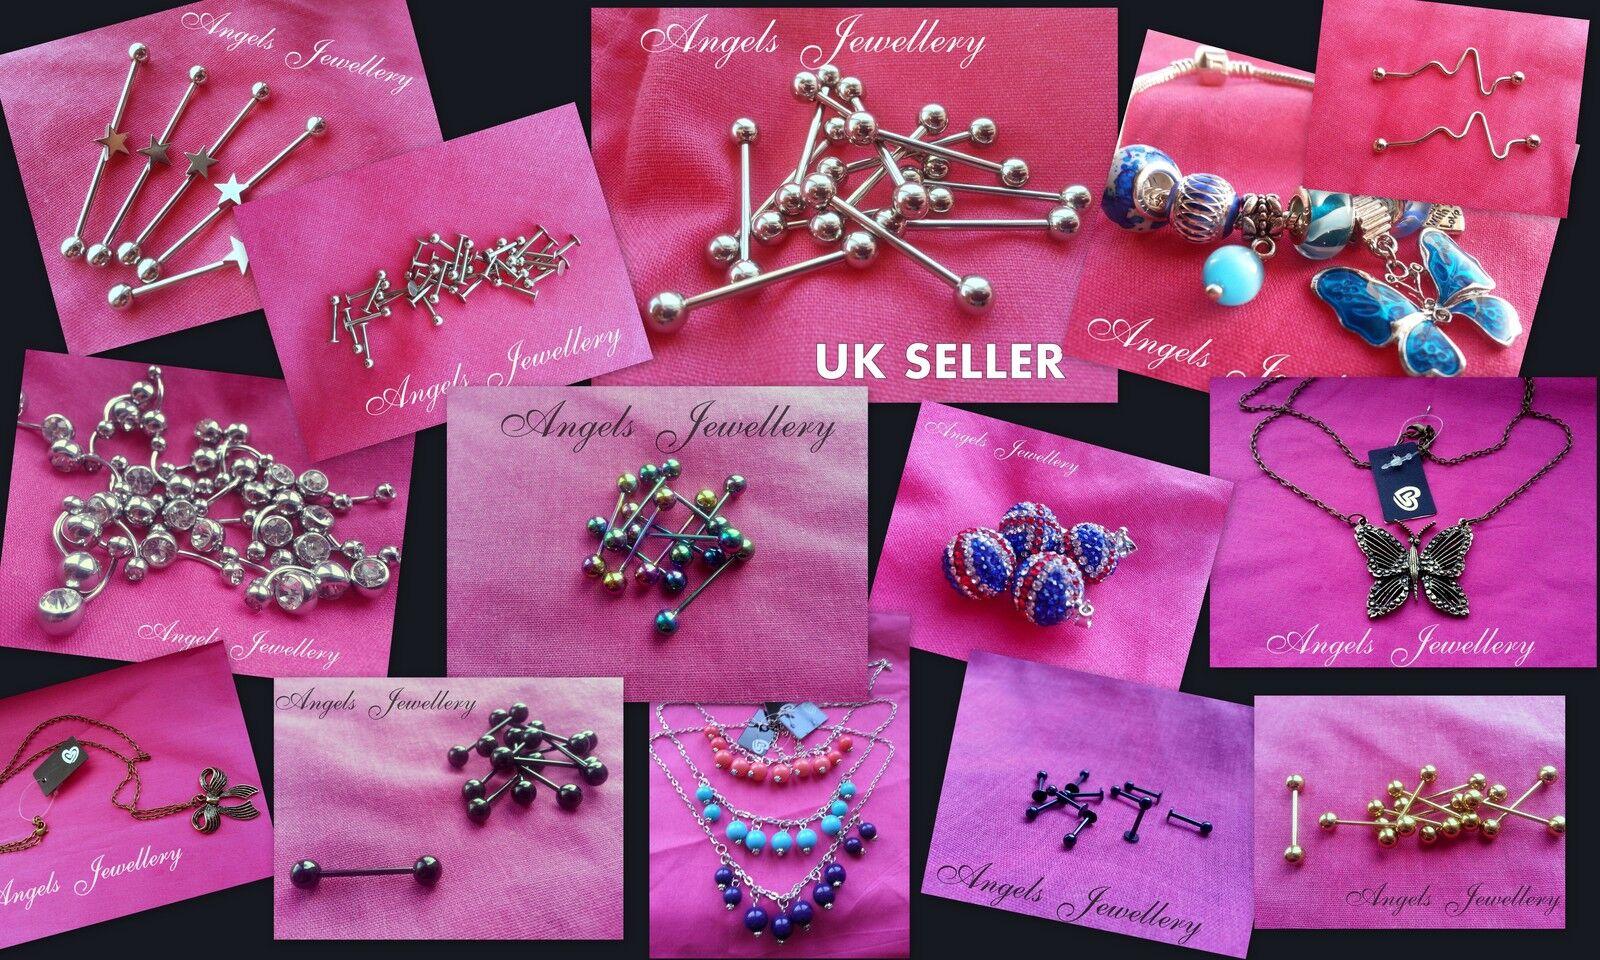 Angels Jewellery